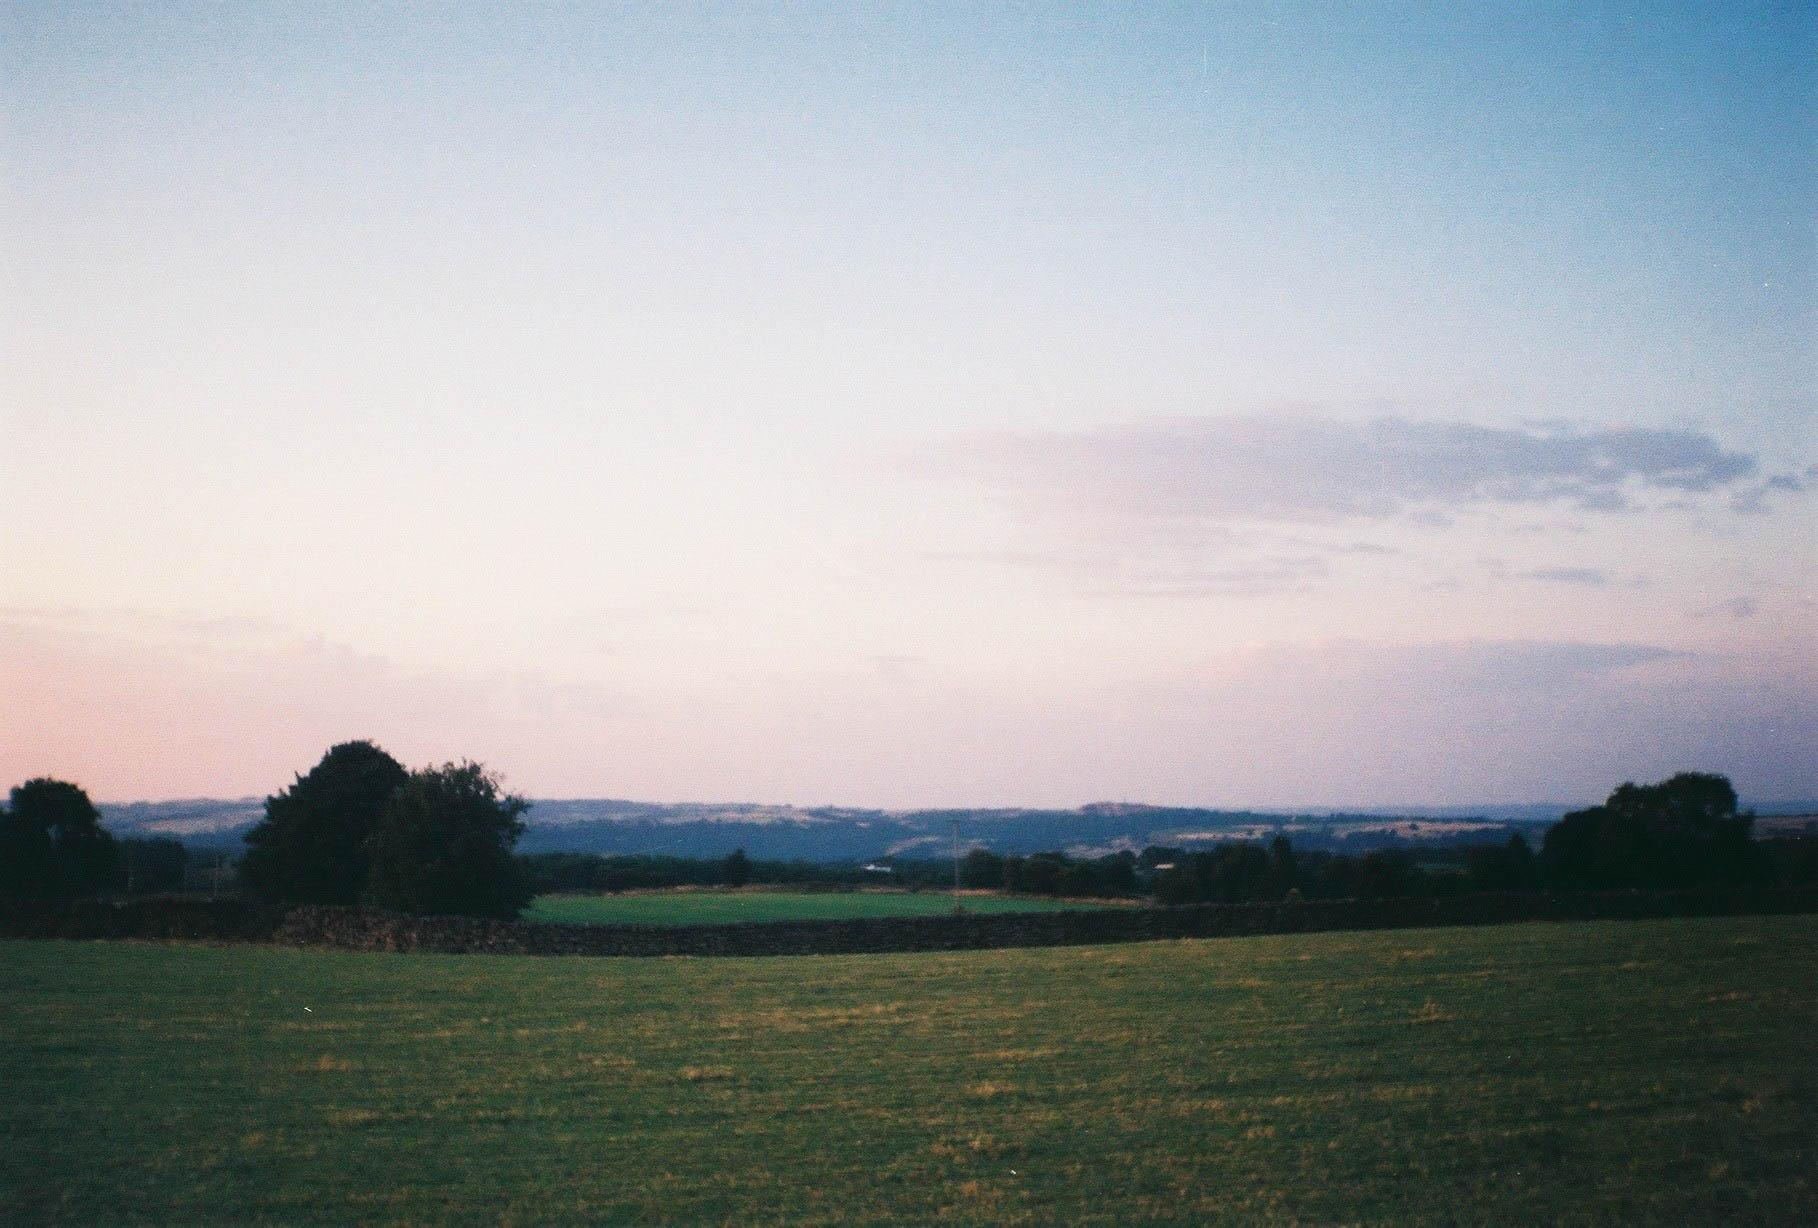 Countryside, Alport, Belper, Derbyshire, Amber Valley, East Midlands, Blogs, Photography, Film, 35mm, Olympus Trip MD3, Katie Writes, katiebwrites, KatieWritesBlog, KatieWritesUK, ©Katiewrites.co.uk